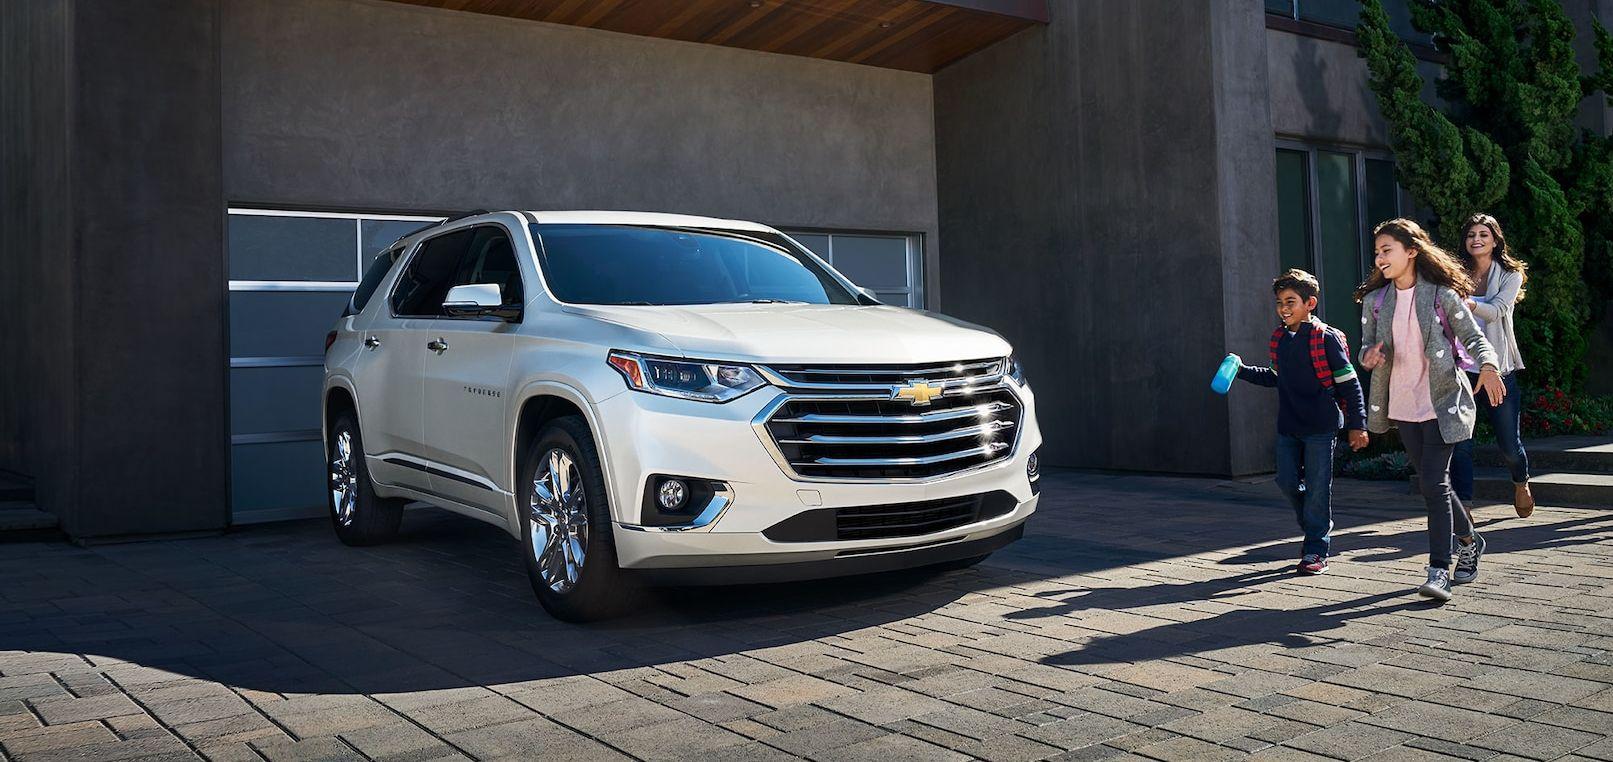 2019 Chevrolet Traverse for Sale near Owasso, OK